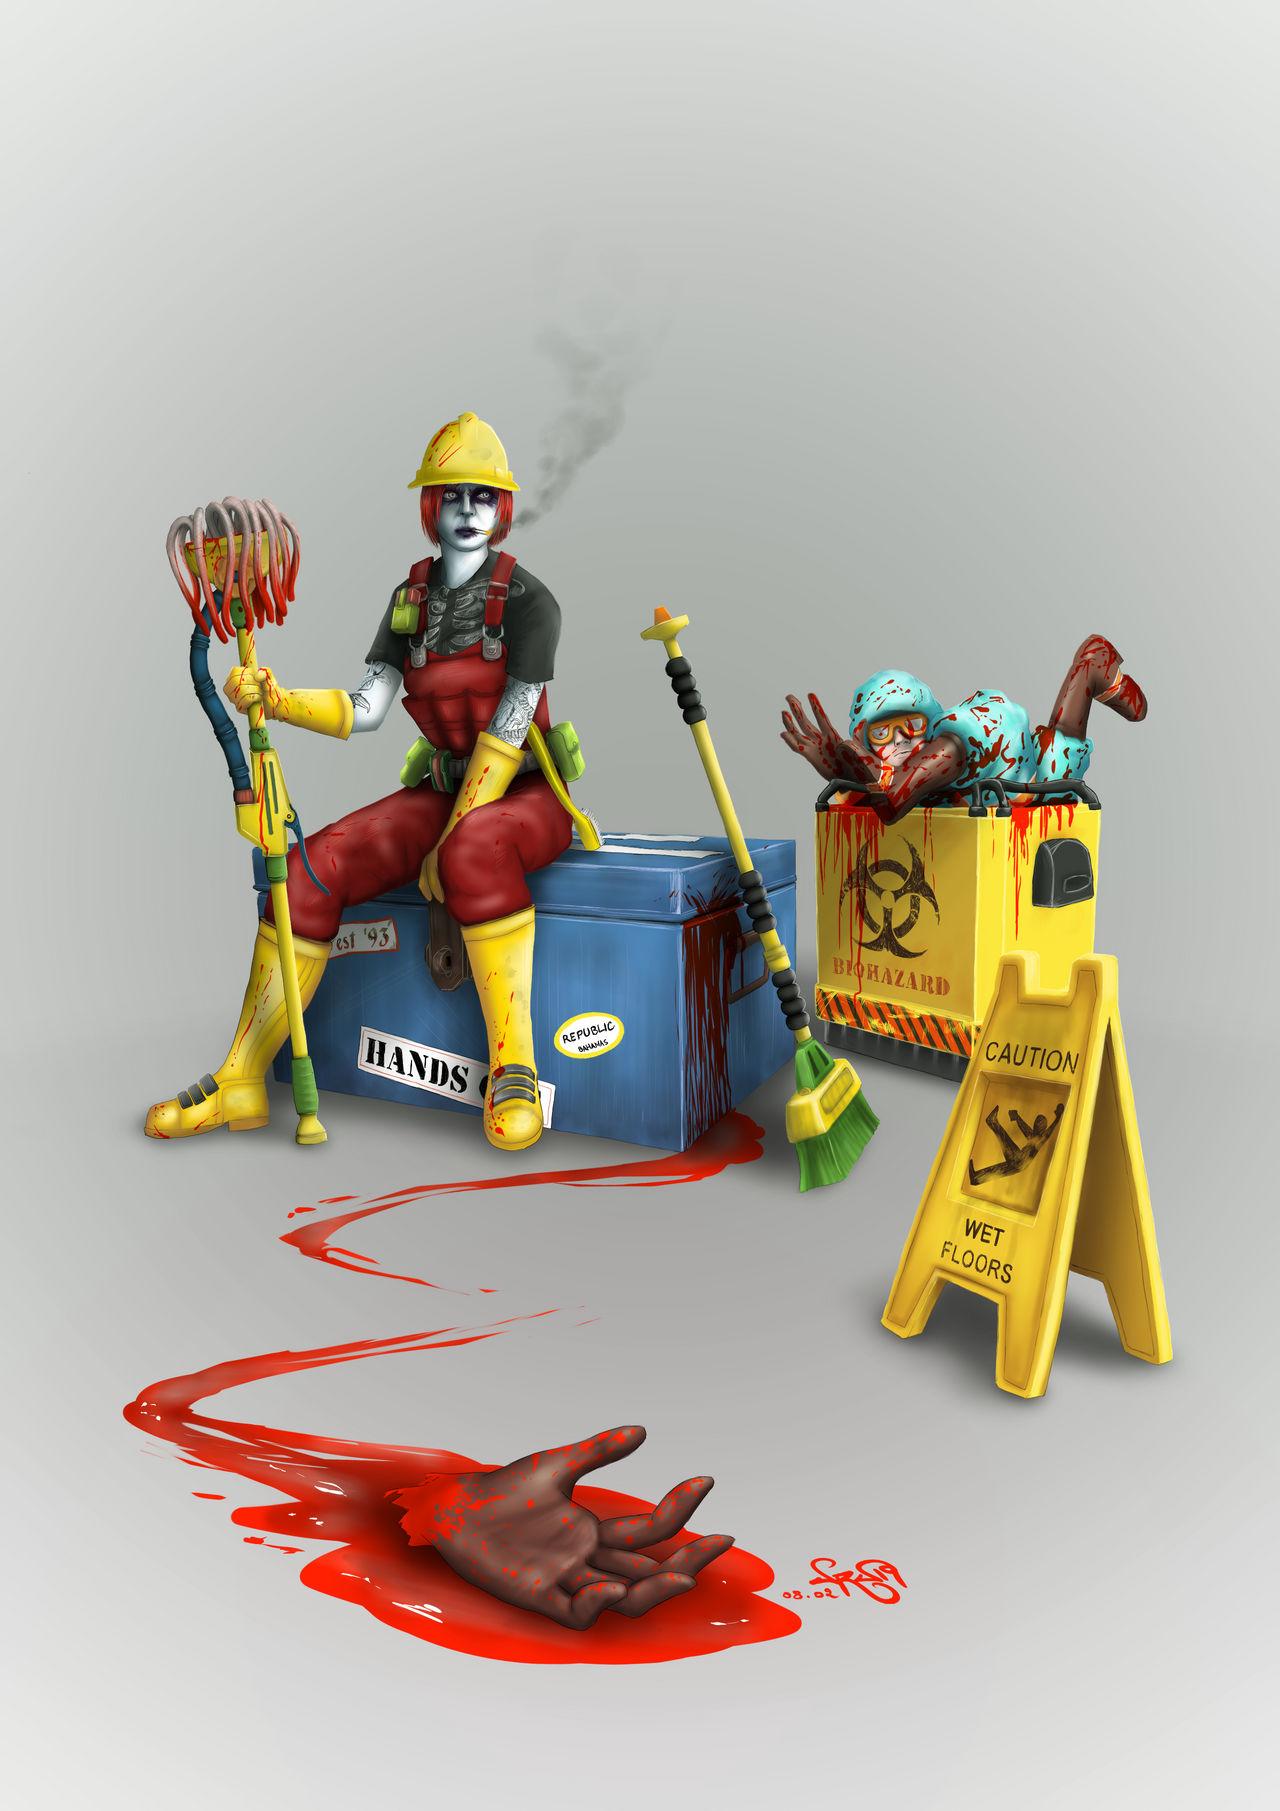 Psycho Janitor by devil-urumi on DeviantArt